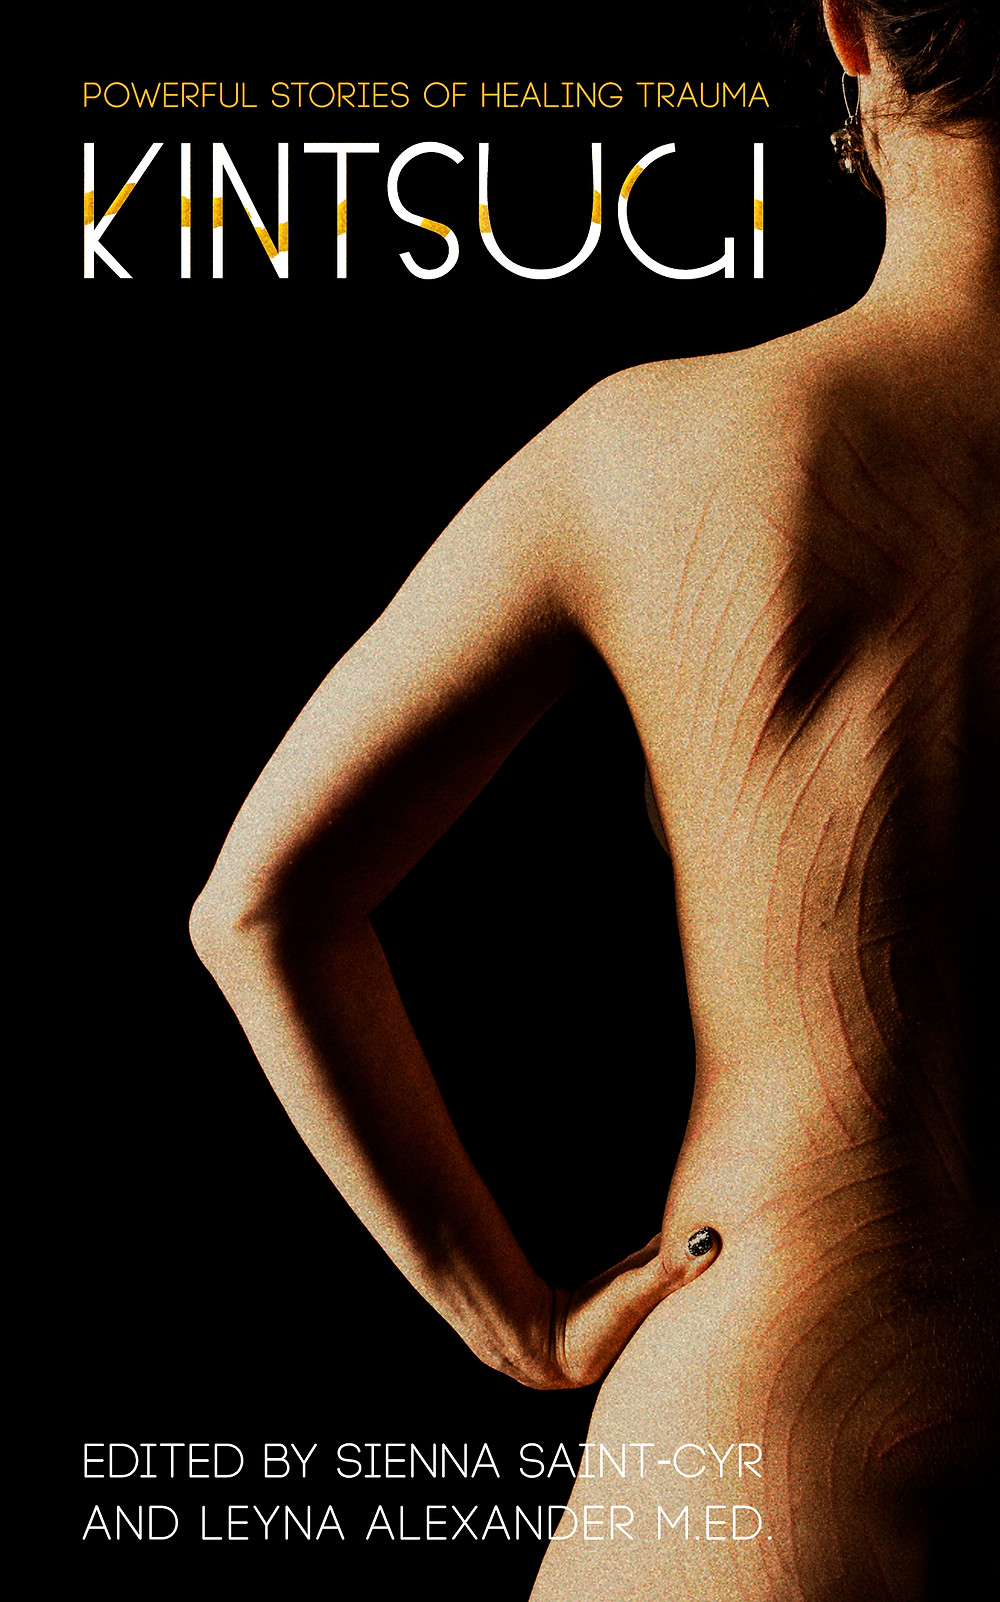 kintsugi powerful stories of healing trauma bare back book cover